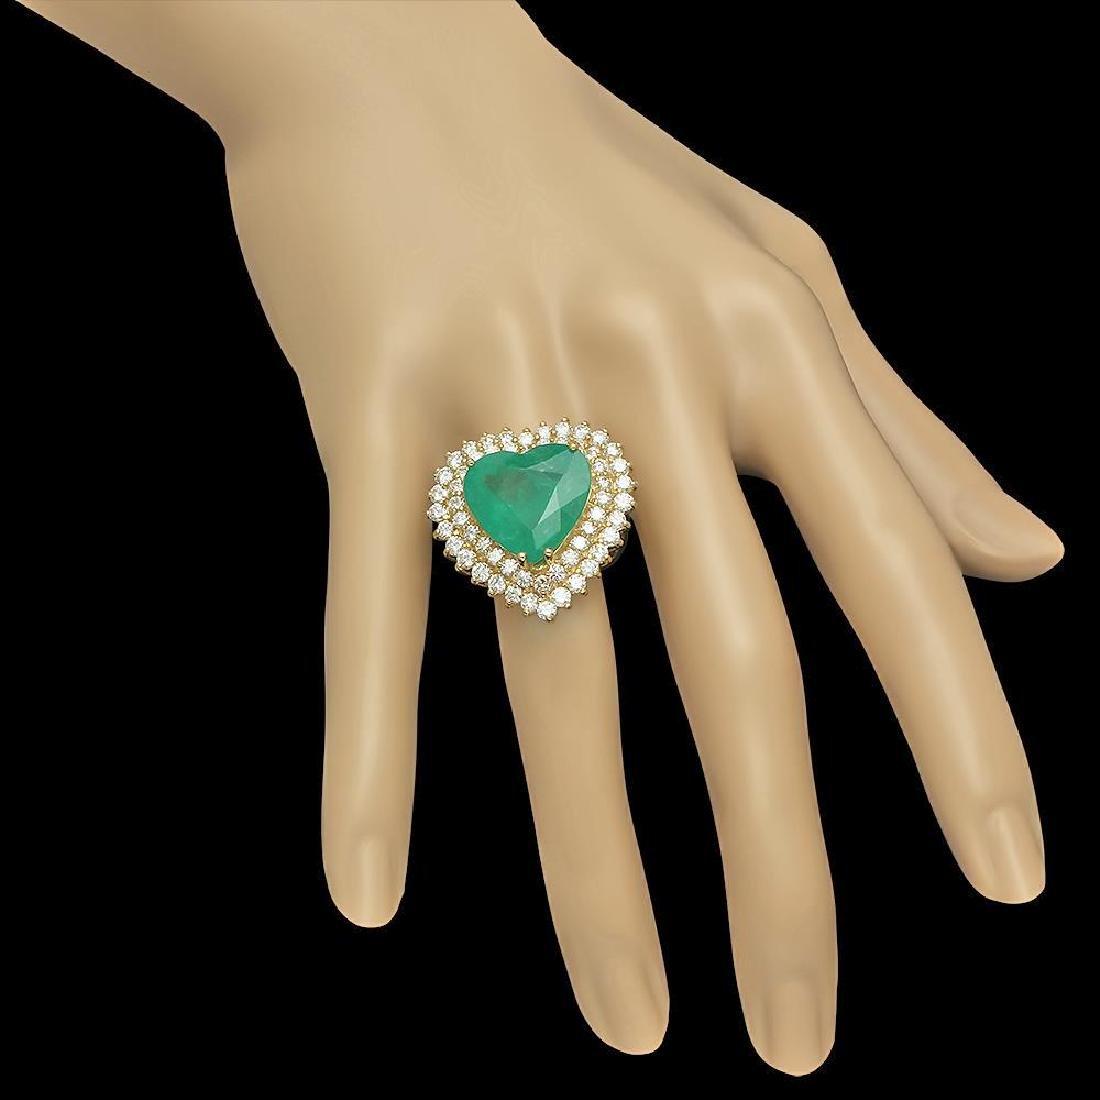 14K Gold 11.09ct Emerald 2.83ct Diamond Ring - 3